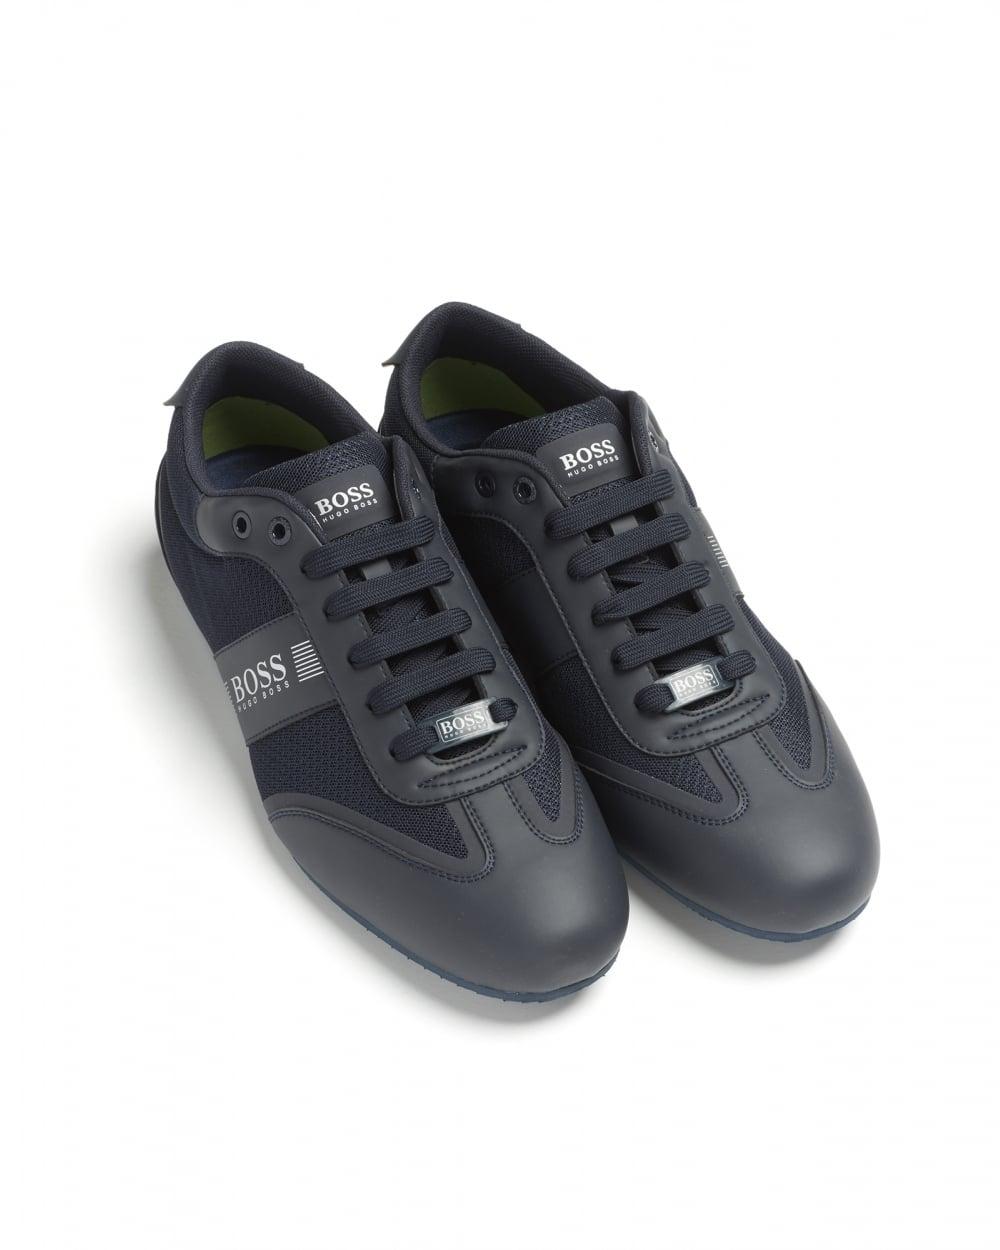 Mens Maze_Lowp_neo2 Low-Top Sneakers, Black HUGO BOSS